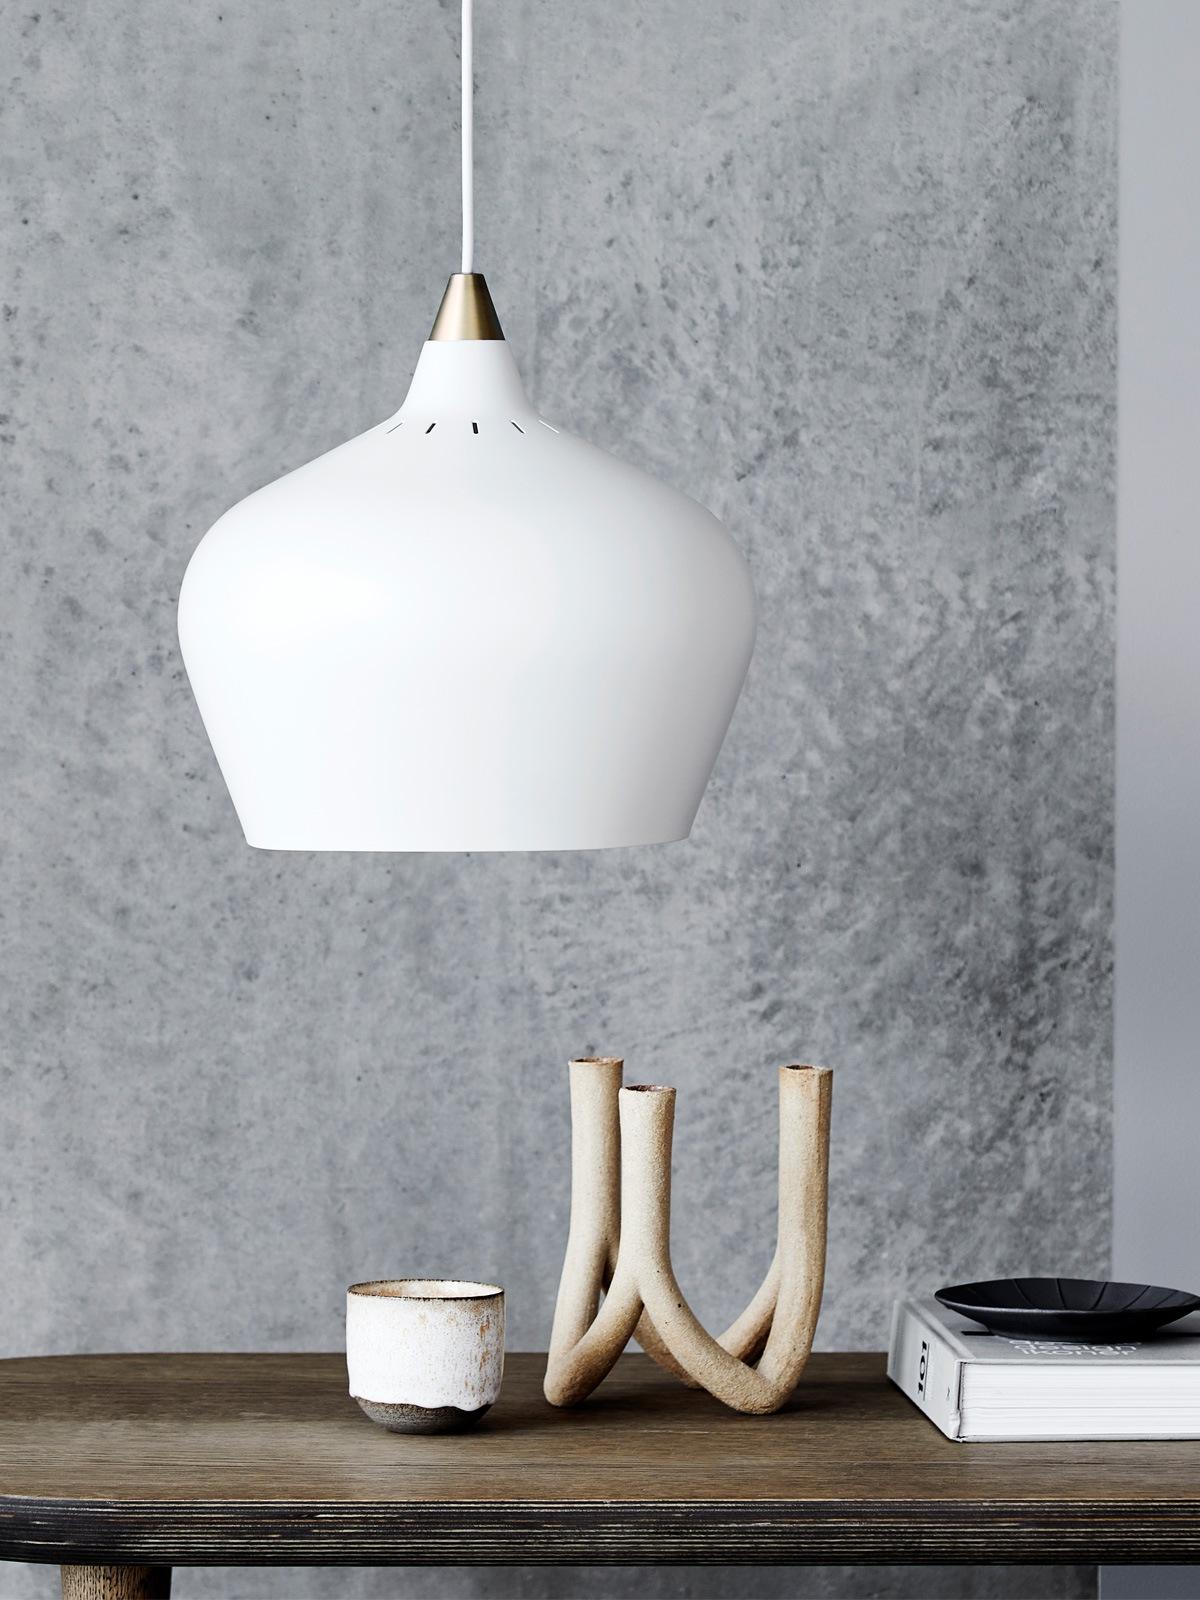 Cohen Pendelleuchte Frandsen DesignOrt Lampen Onlineshop Berlin